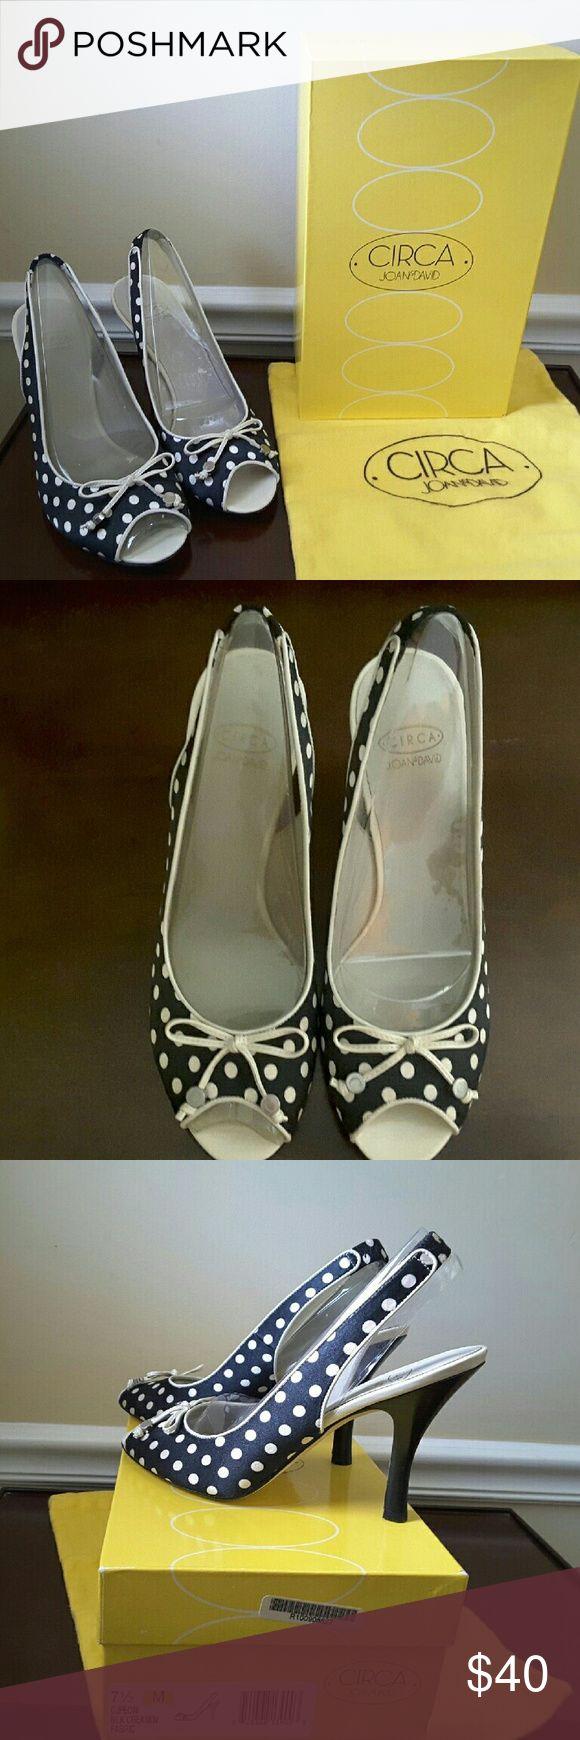 "Circa Joan & David peep toe heels Beautiful, brand new Circa Joan & David peep toe, sling back 3"" heels.  Black and white polka dots. Size 7.5. Box and dust bag included. Joan & David Shoes Heels"